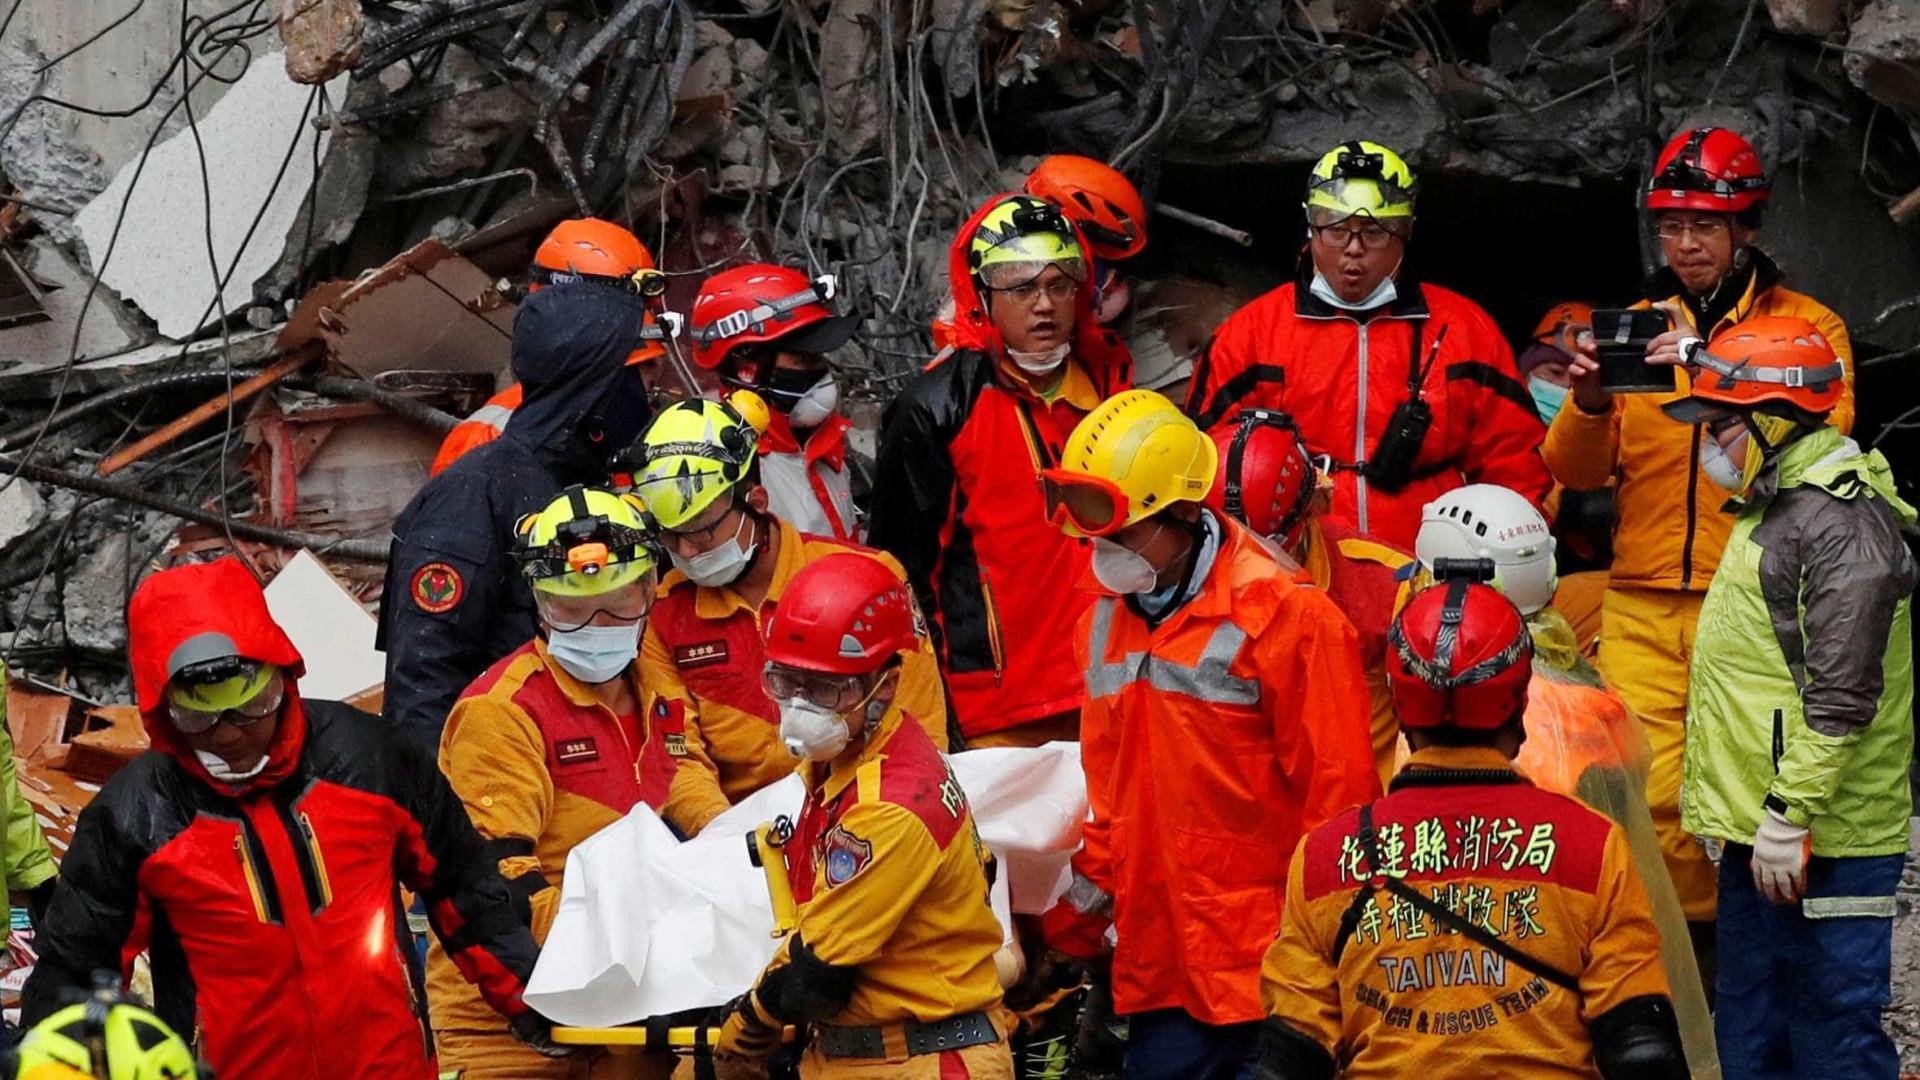 Novo terremoto atinge Taiwan nesta quarta